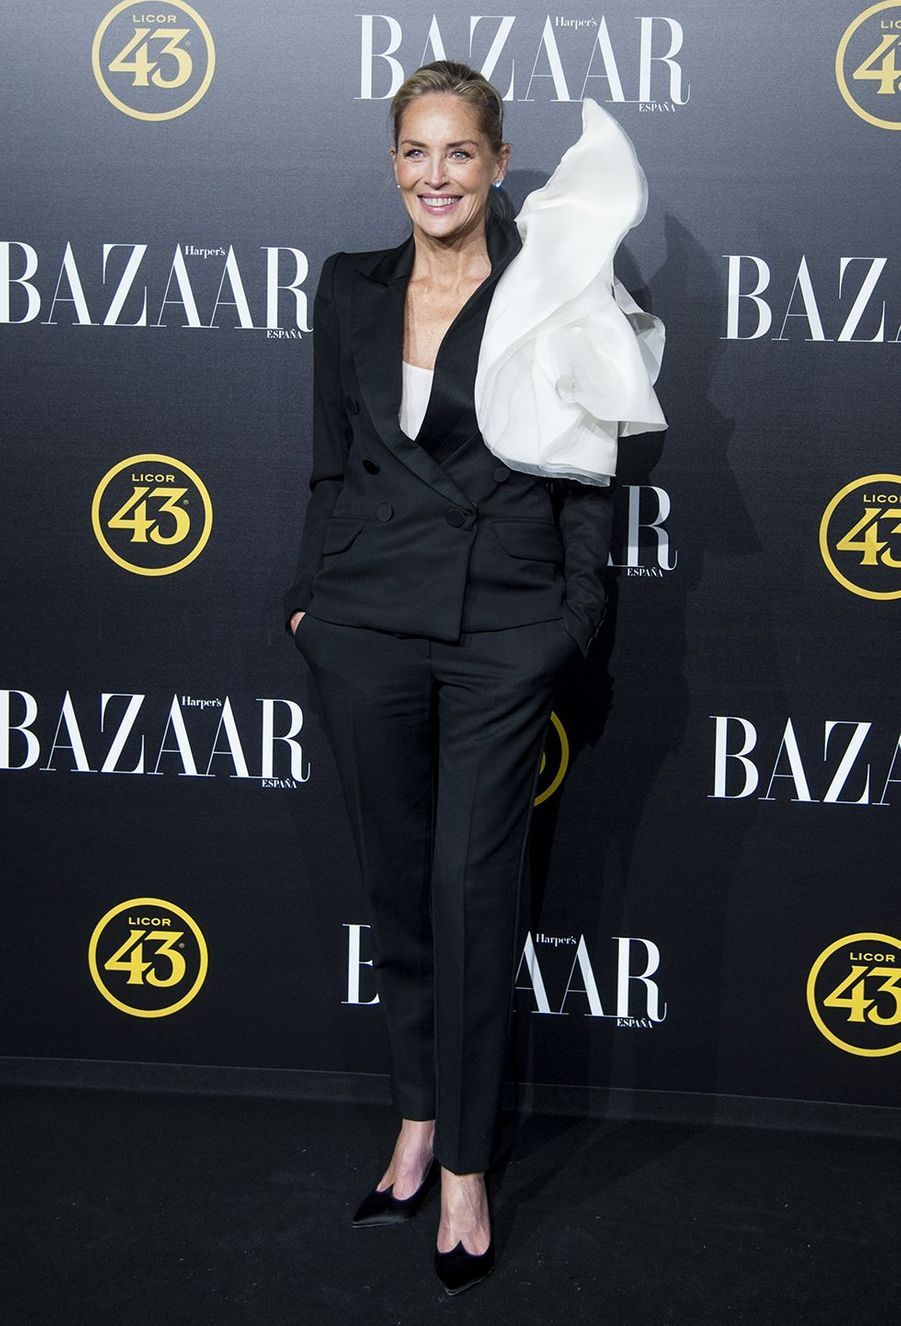 Sharon Stone lors dela soirée Harper Bazaar Attitude 43 Awards à Madrid le 5 novembre 2019.